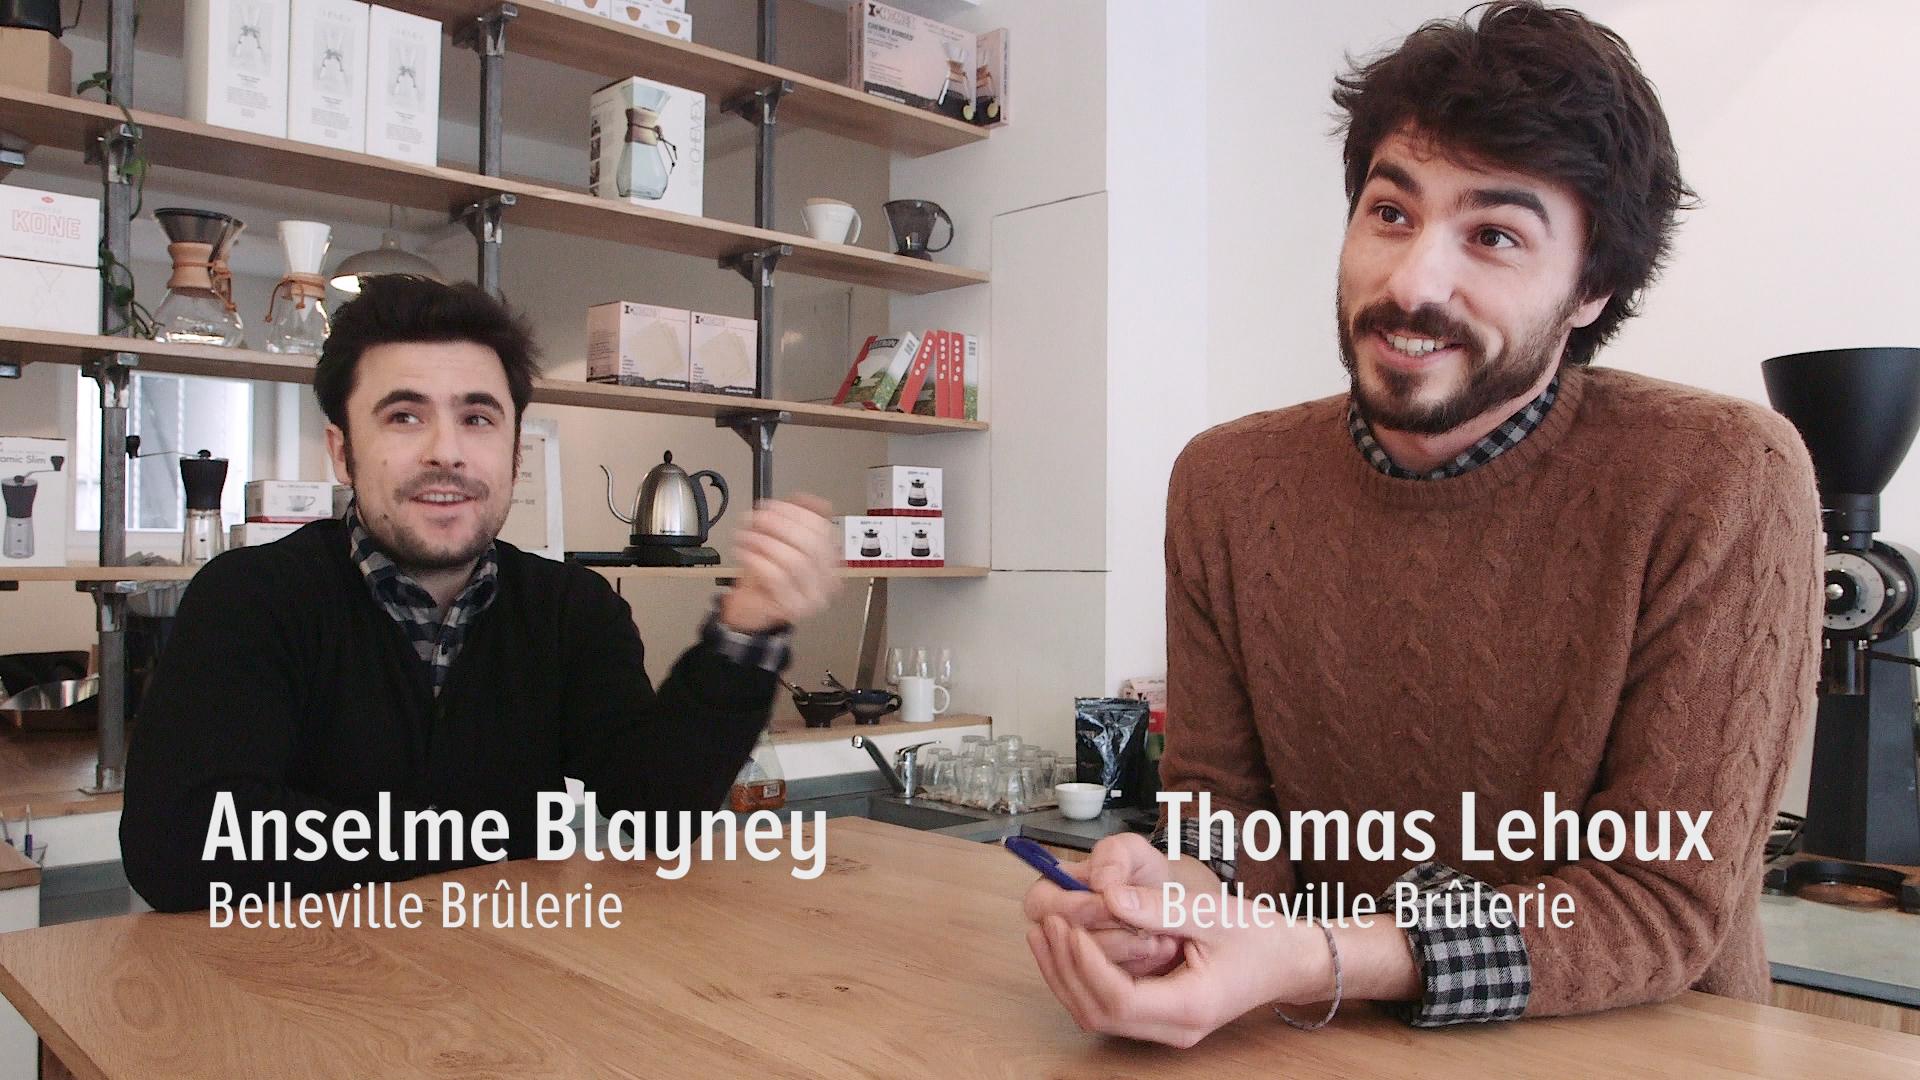 Anselme Blayney and Thomas Lehoux.jpg